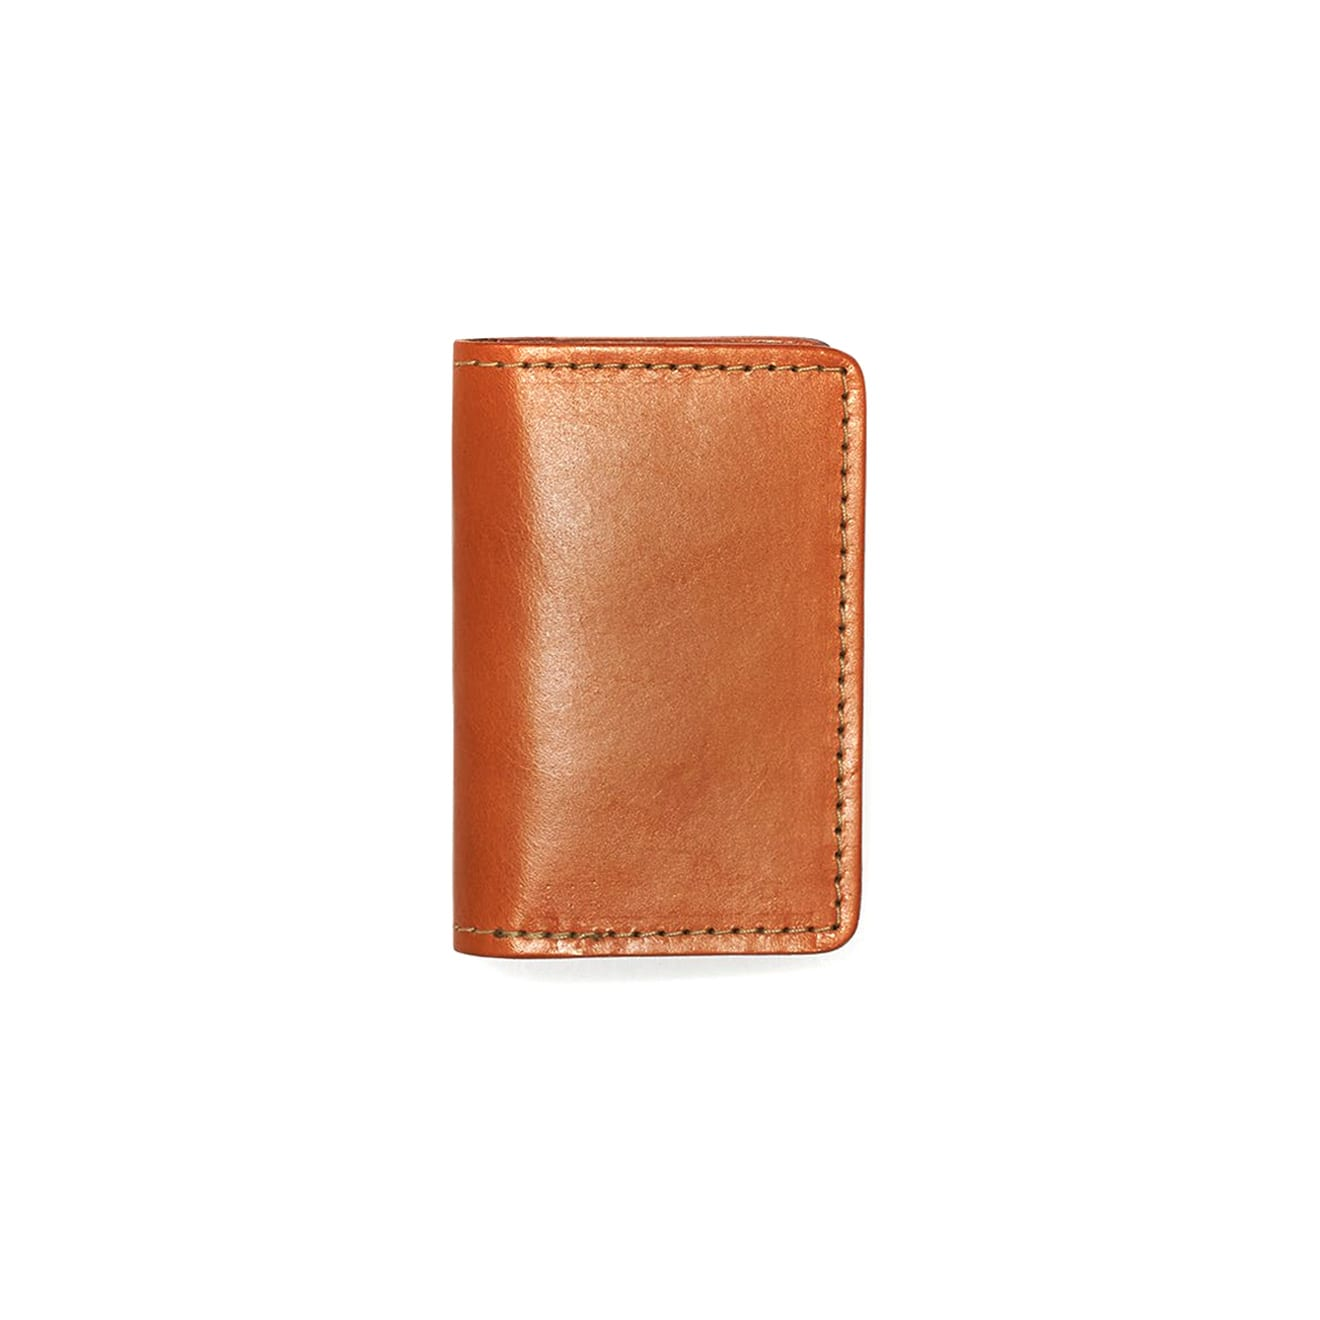 Filson Card Case Tan Leather